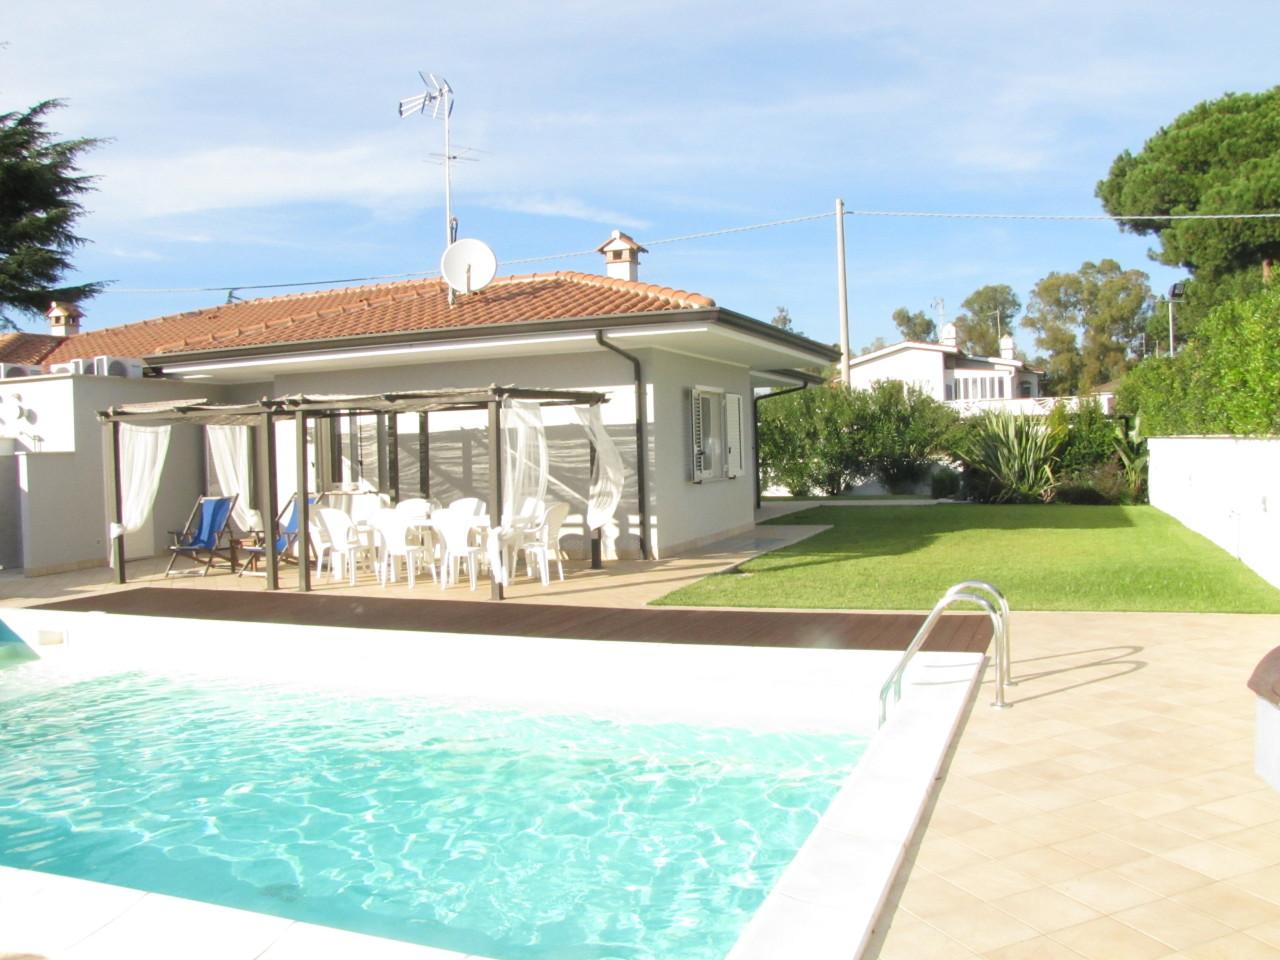 Villa in vendita Rif. 4162475